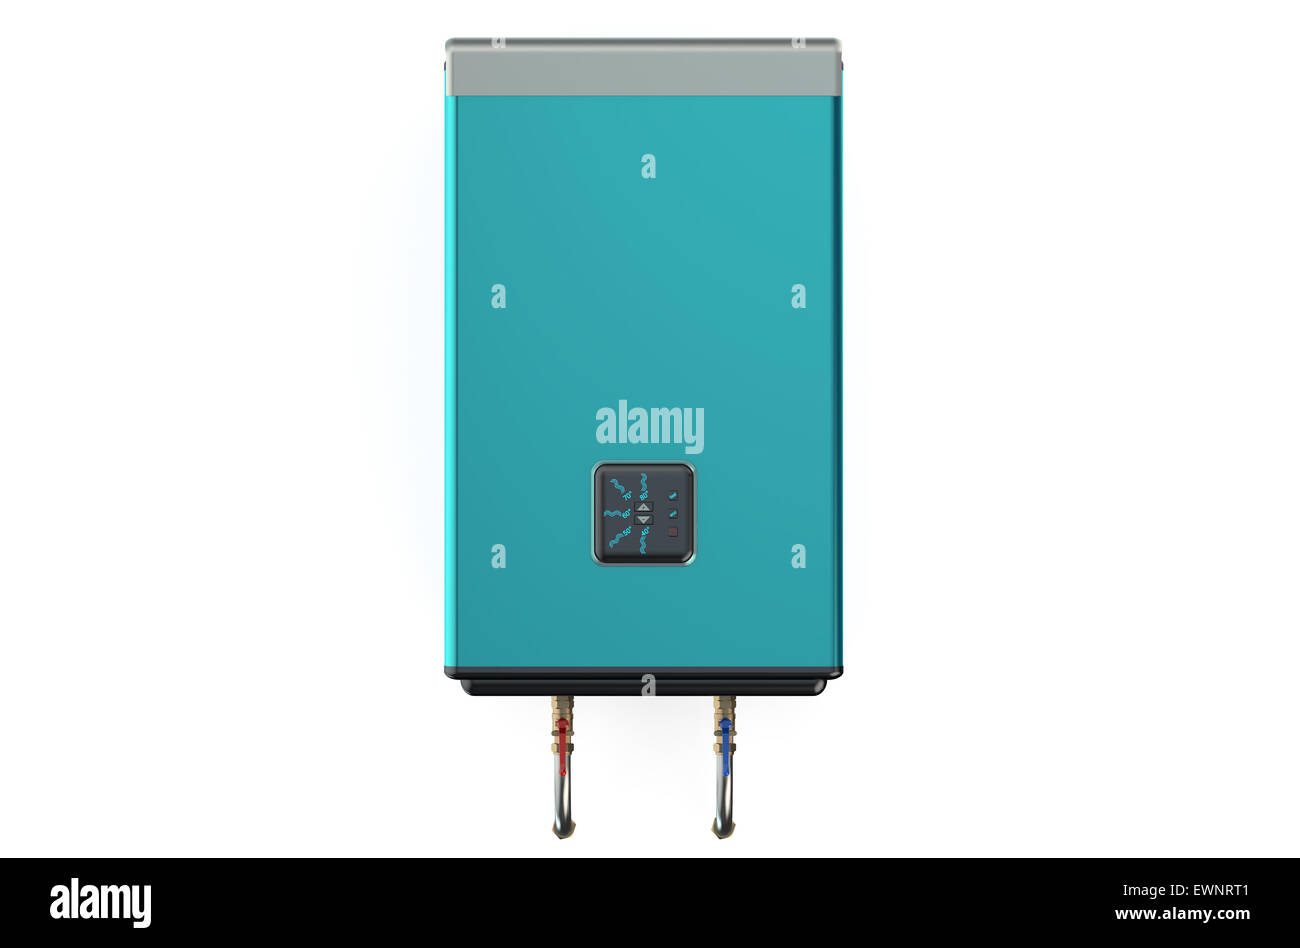 Electric Boiler Stock Photos & Electric Boiler Stock Images - Alamy